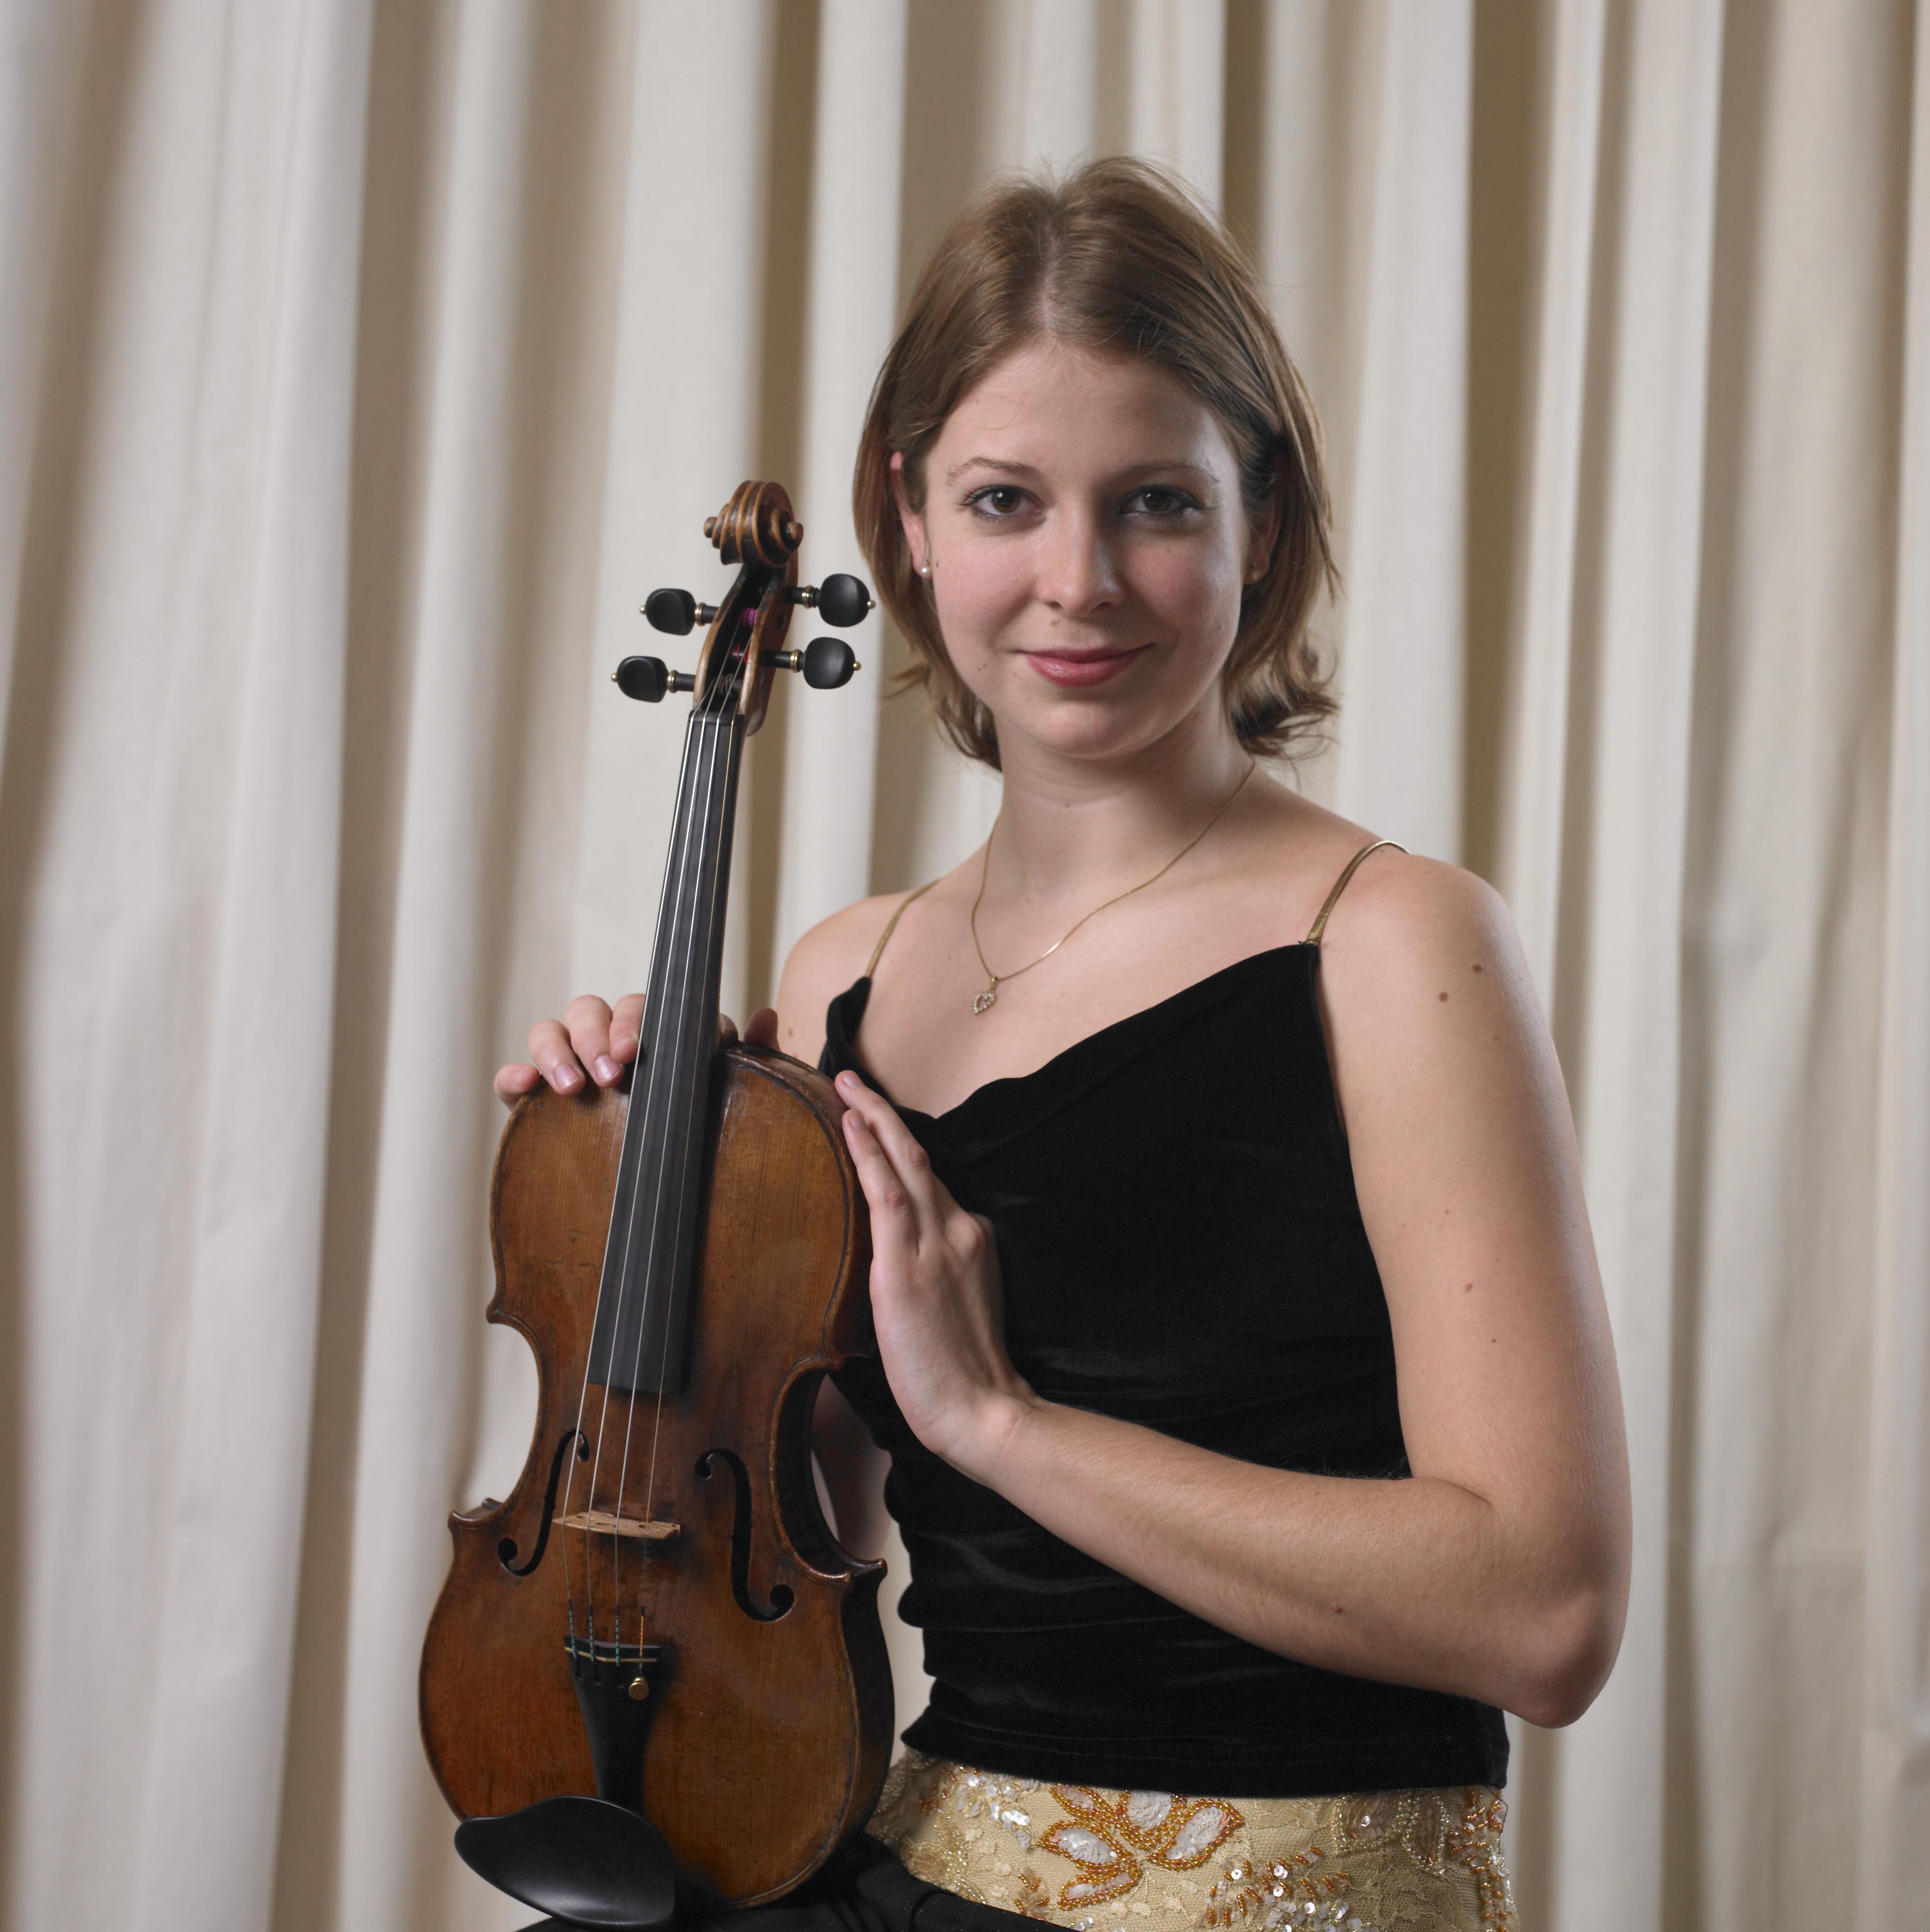 Rahn Musikpreis 2006, Noémie Rufer, 3. Preis Violine